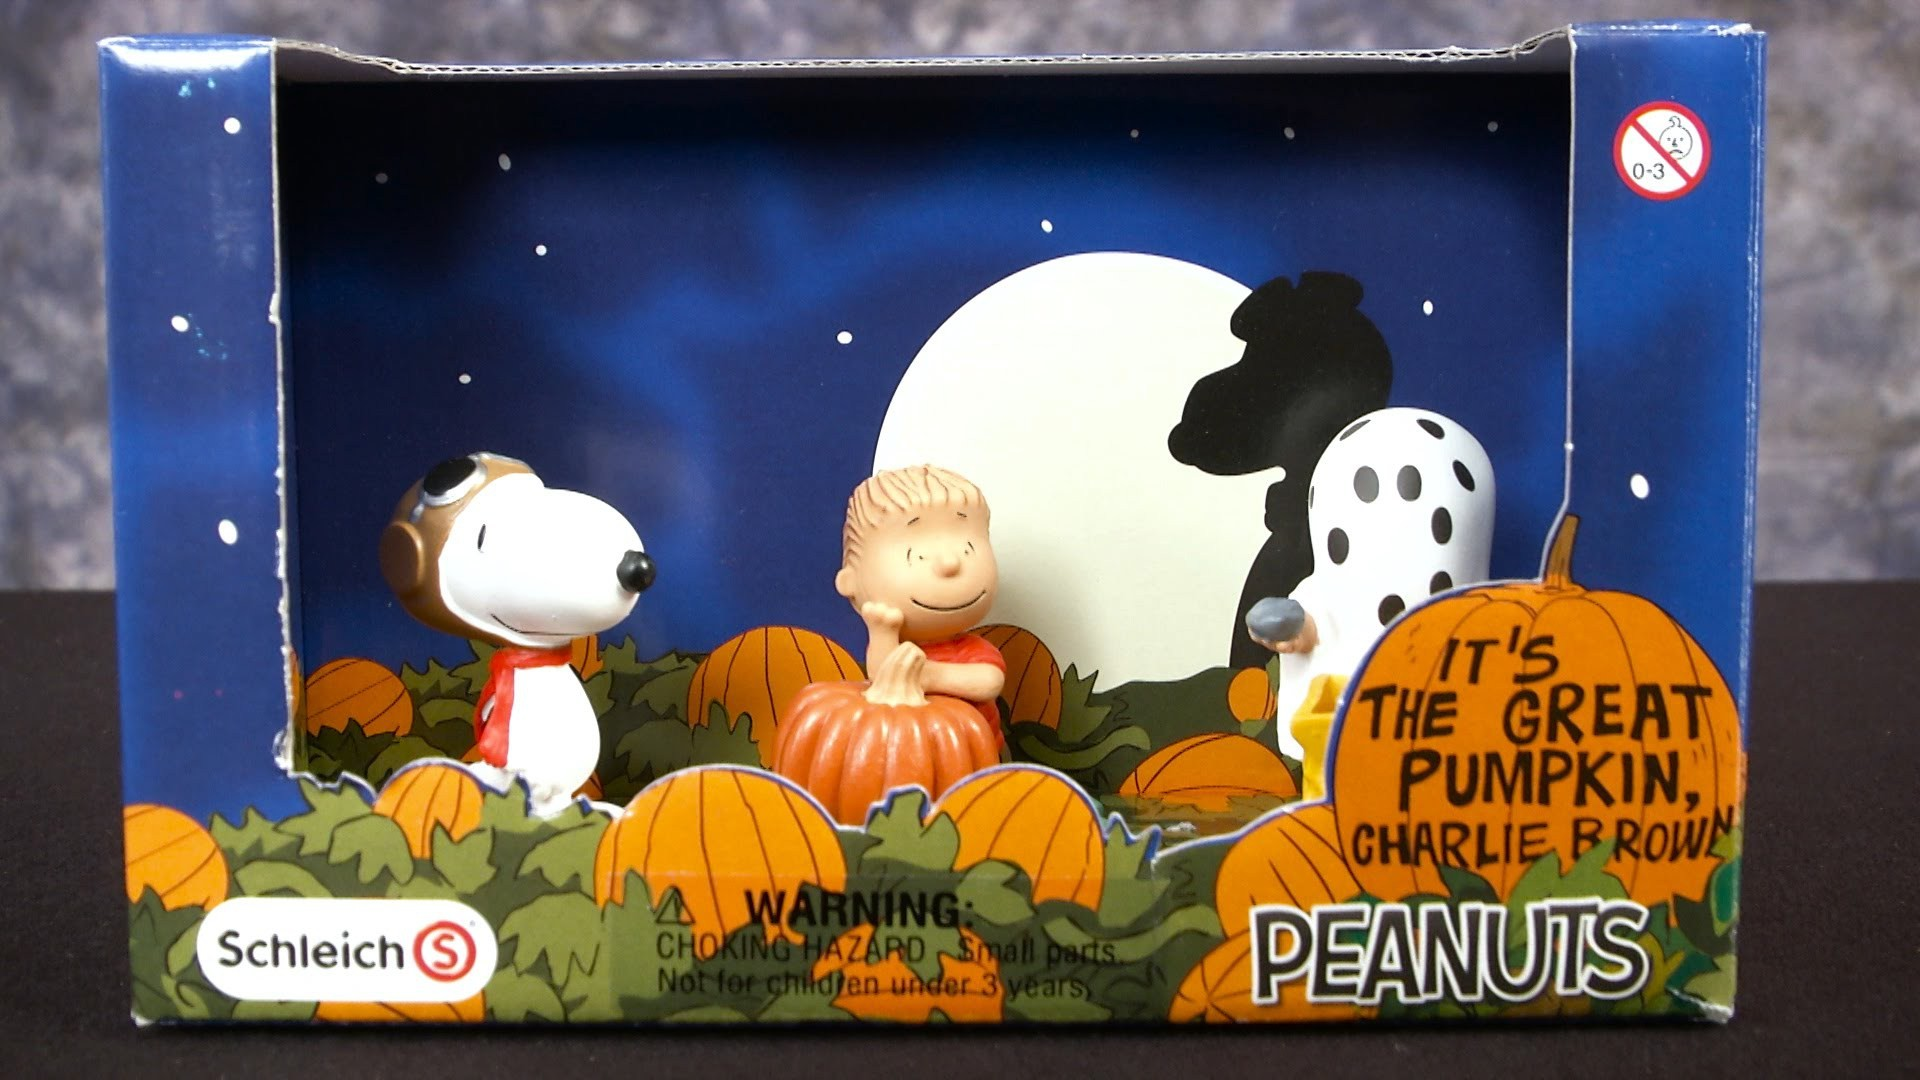 peanuts christmas wallpaper 1080p - photo #30